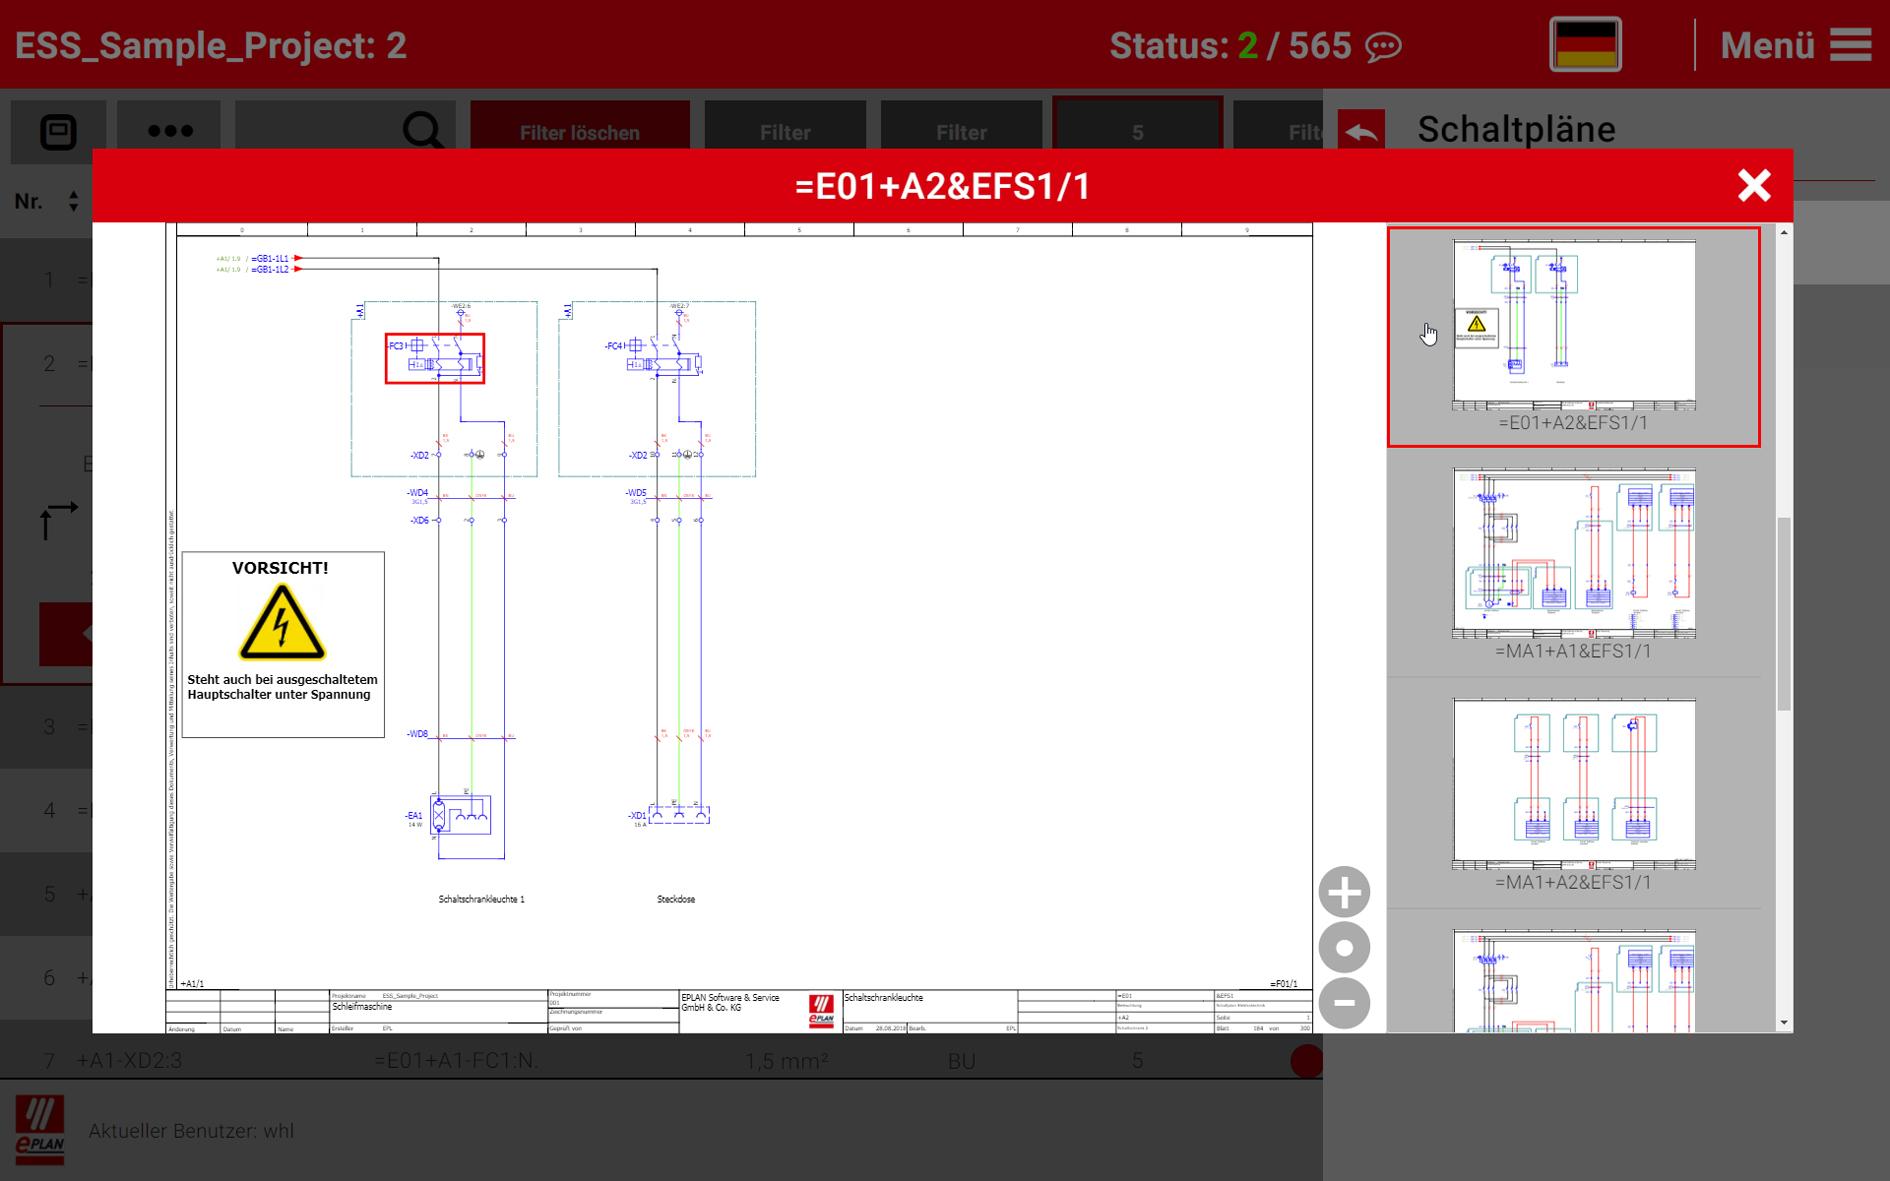 neue version des software tools schaltschrankbau. Black Bedroom Furniture Sets. Home Design Ideas